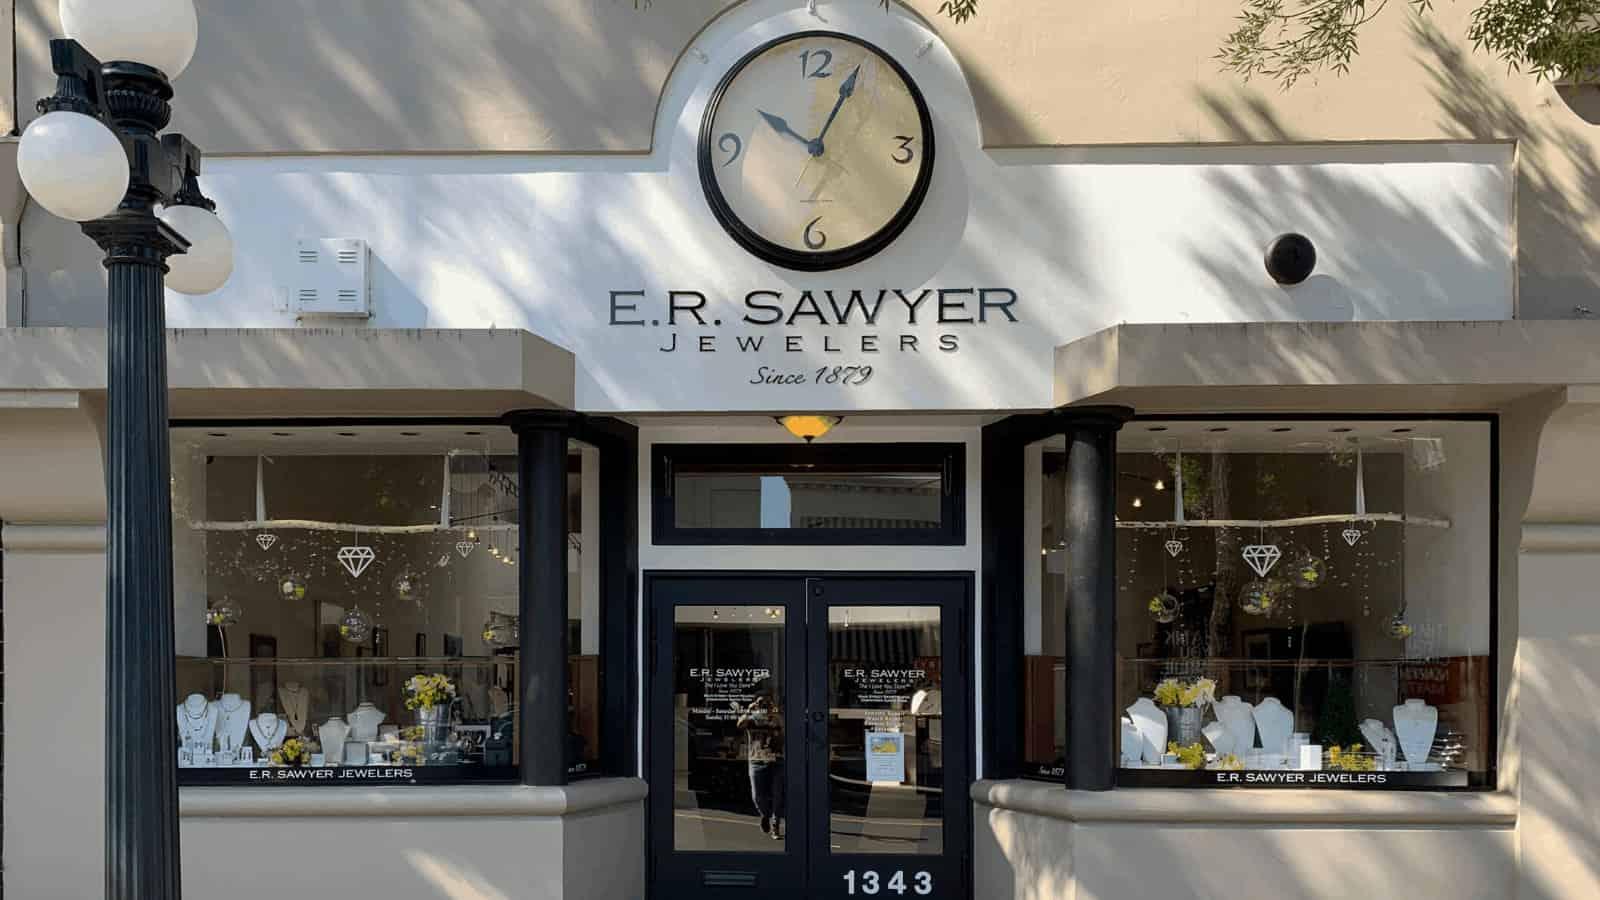 E.R. Sawyer Jewelers